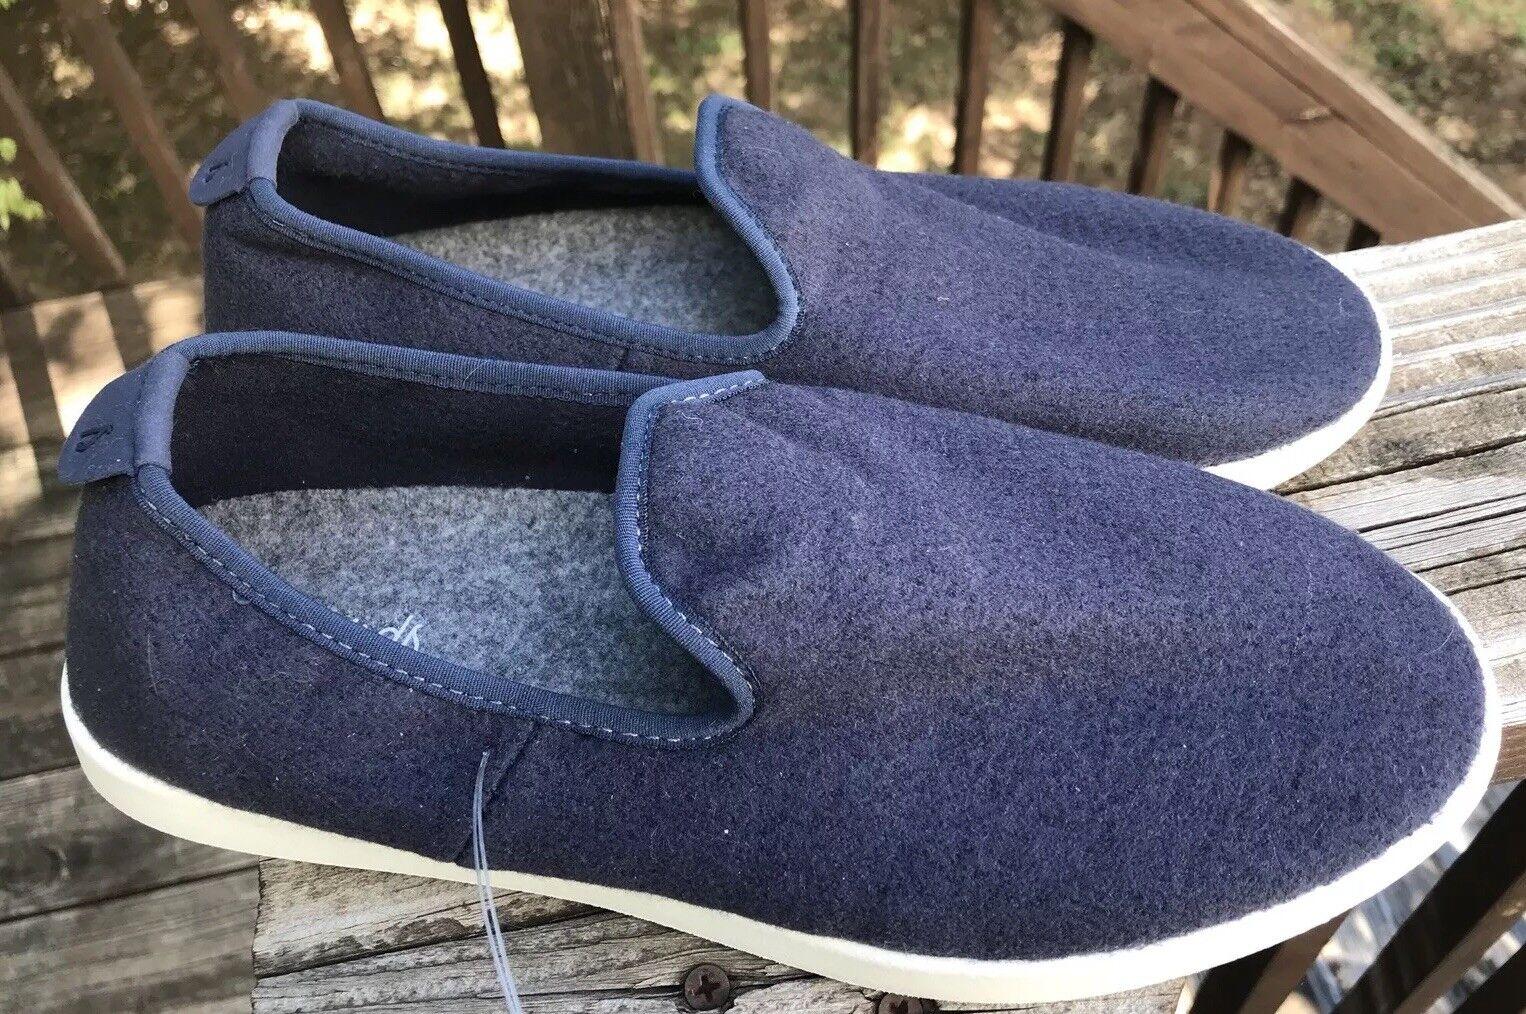 Allbirds Navy Wool Loungers Comfort Damenschuhe Größe 10 Navy Allbirds Blau w Cream Sole 743521